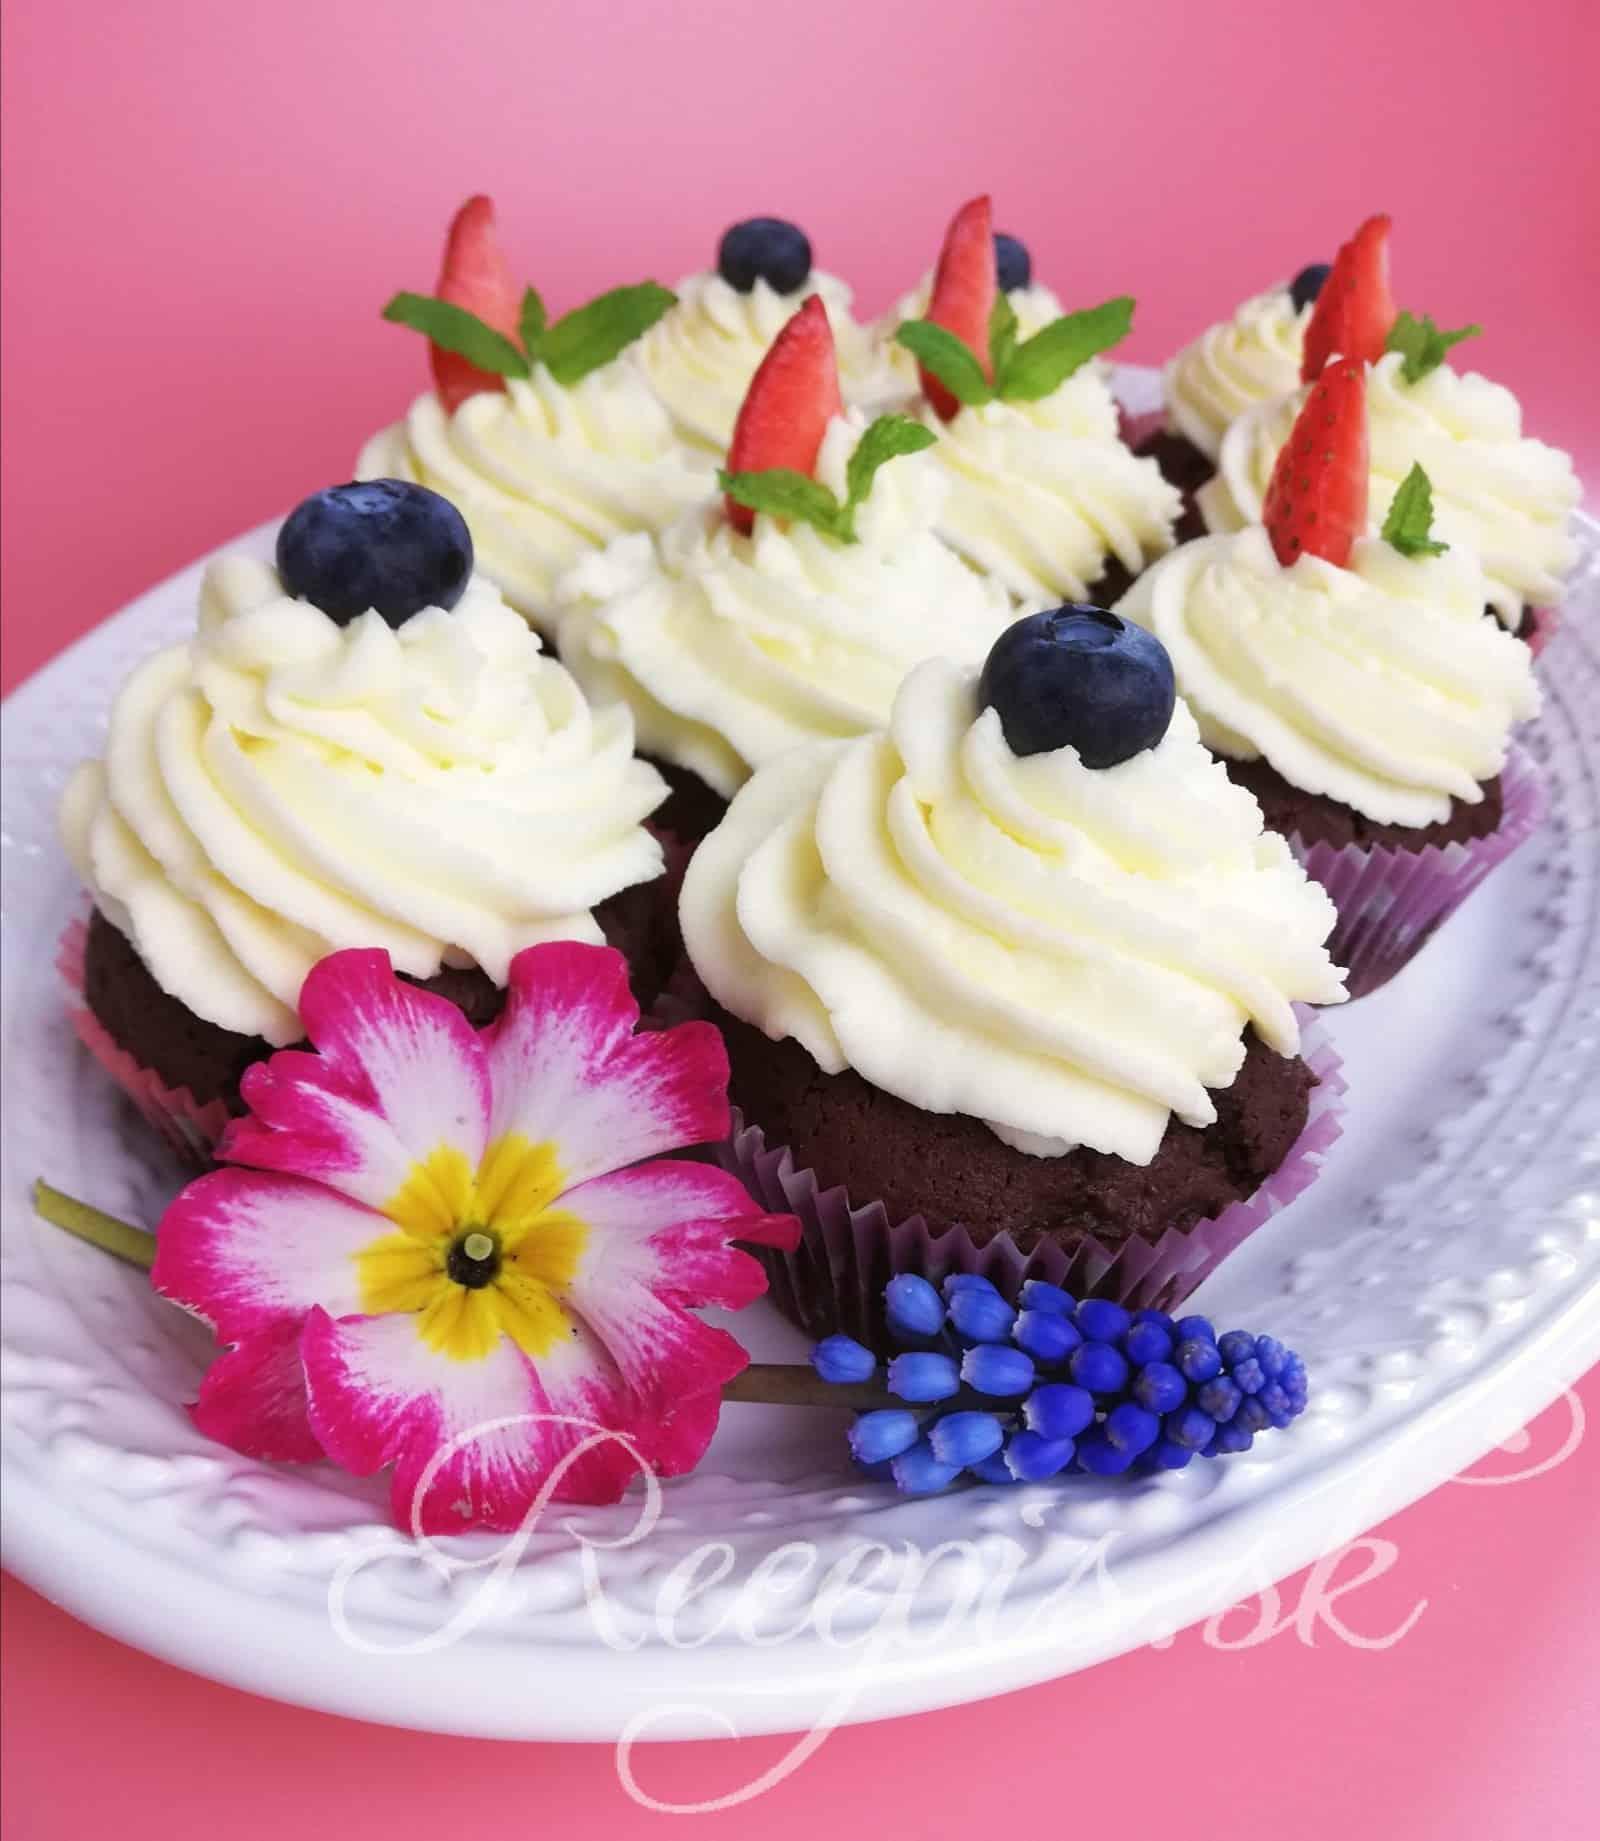 Základný maslový krém na muffiny/cupcakes